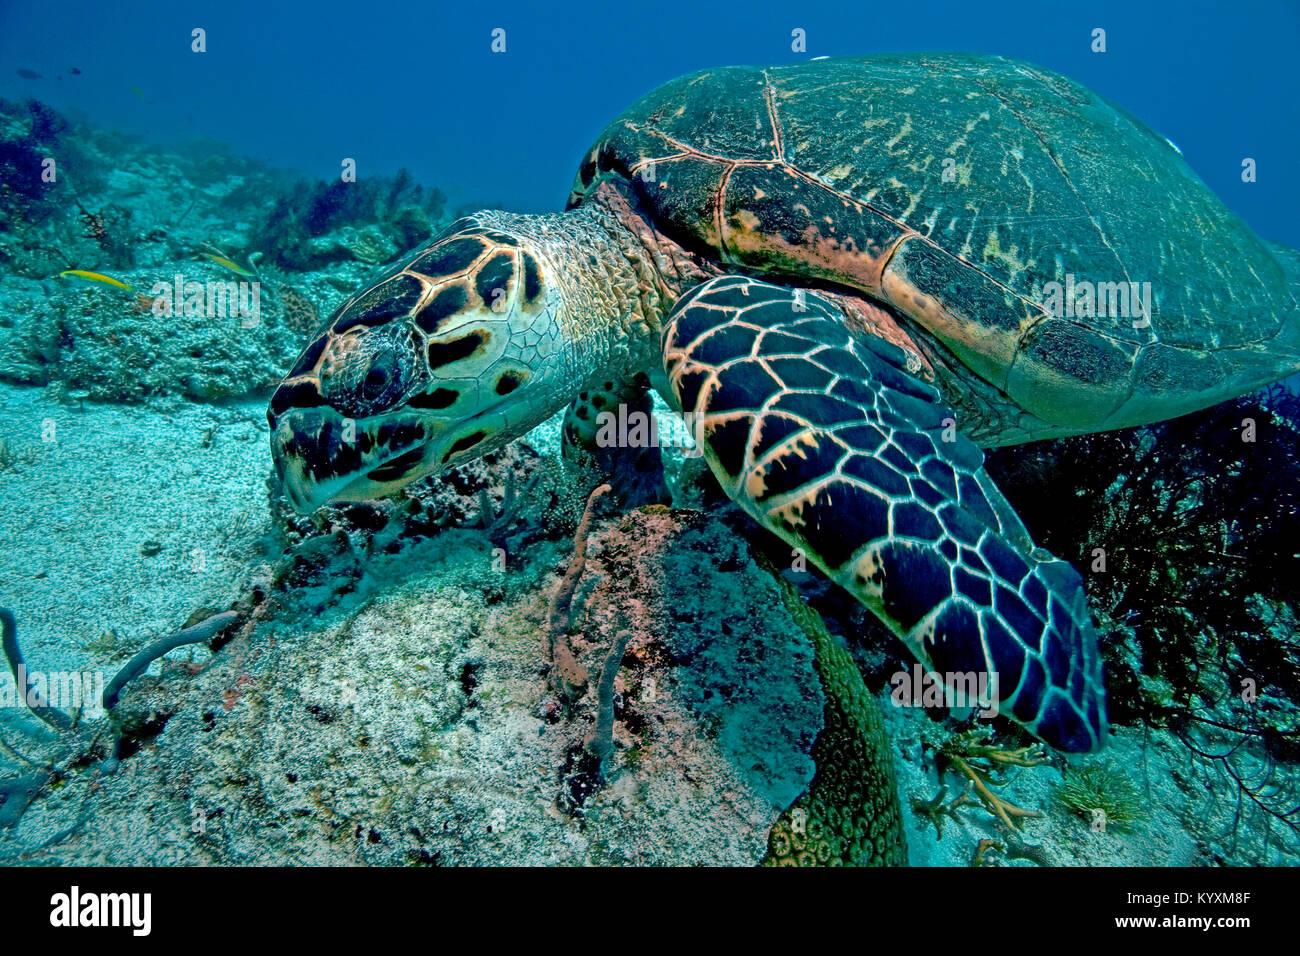 Karettschildkröte (Eretmochelys imbricata), Playa del Carmen, Yucatan, Mexiko, Karibik Stockbild